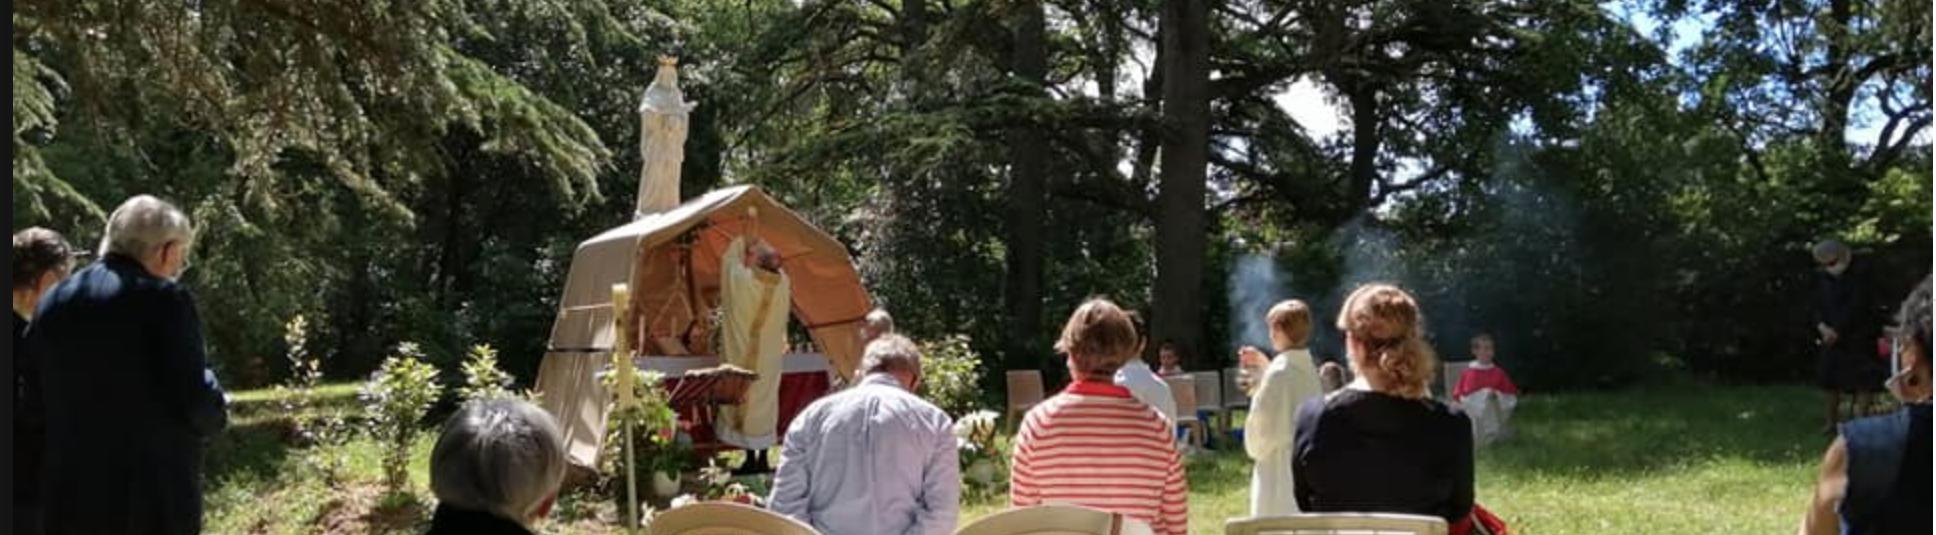 Reprise de la Sainte Messe